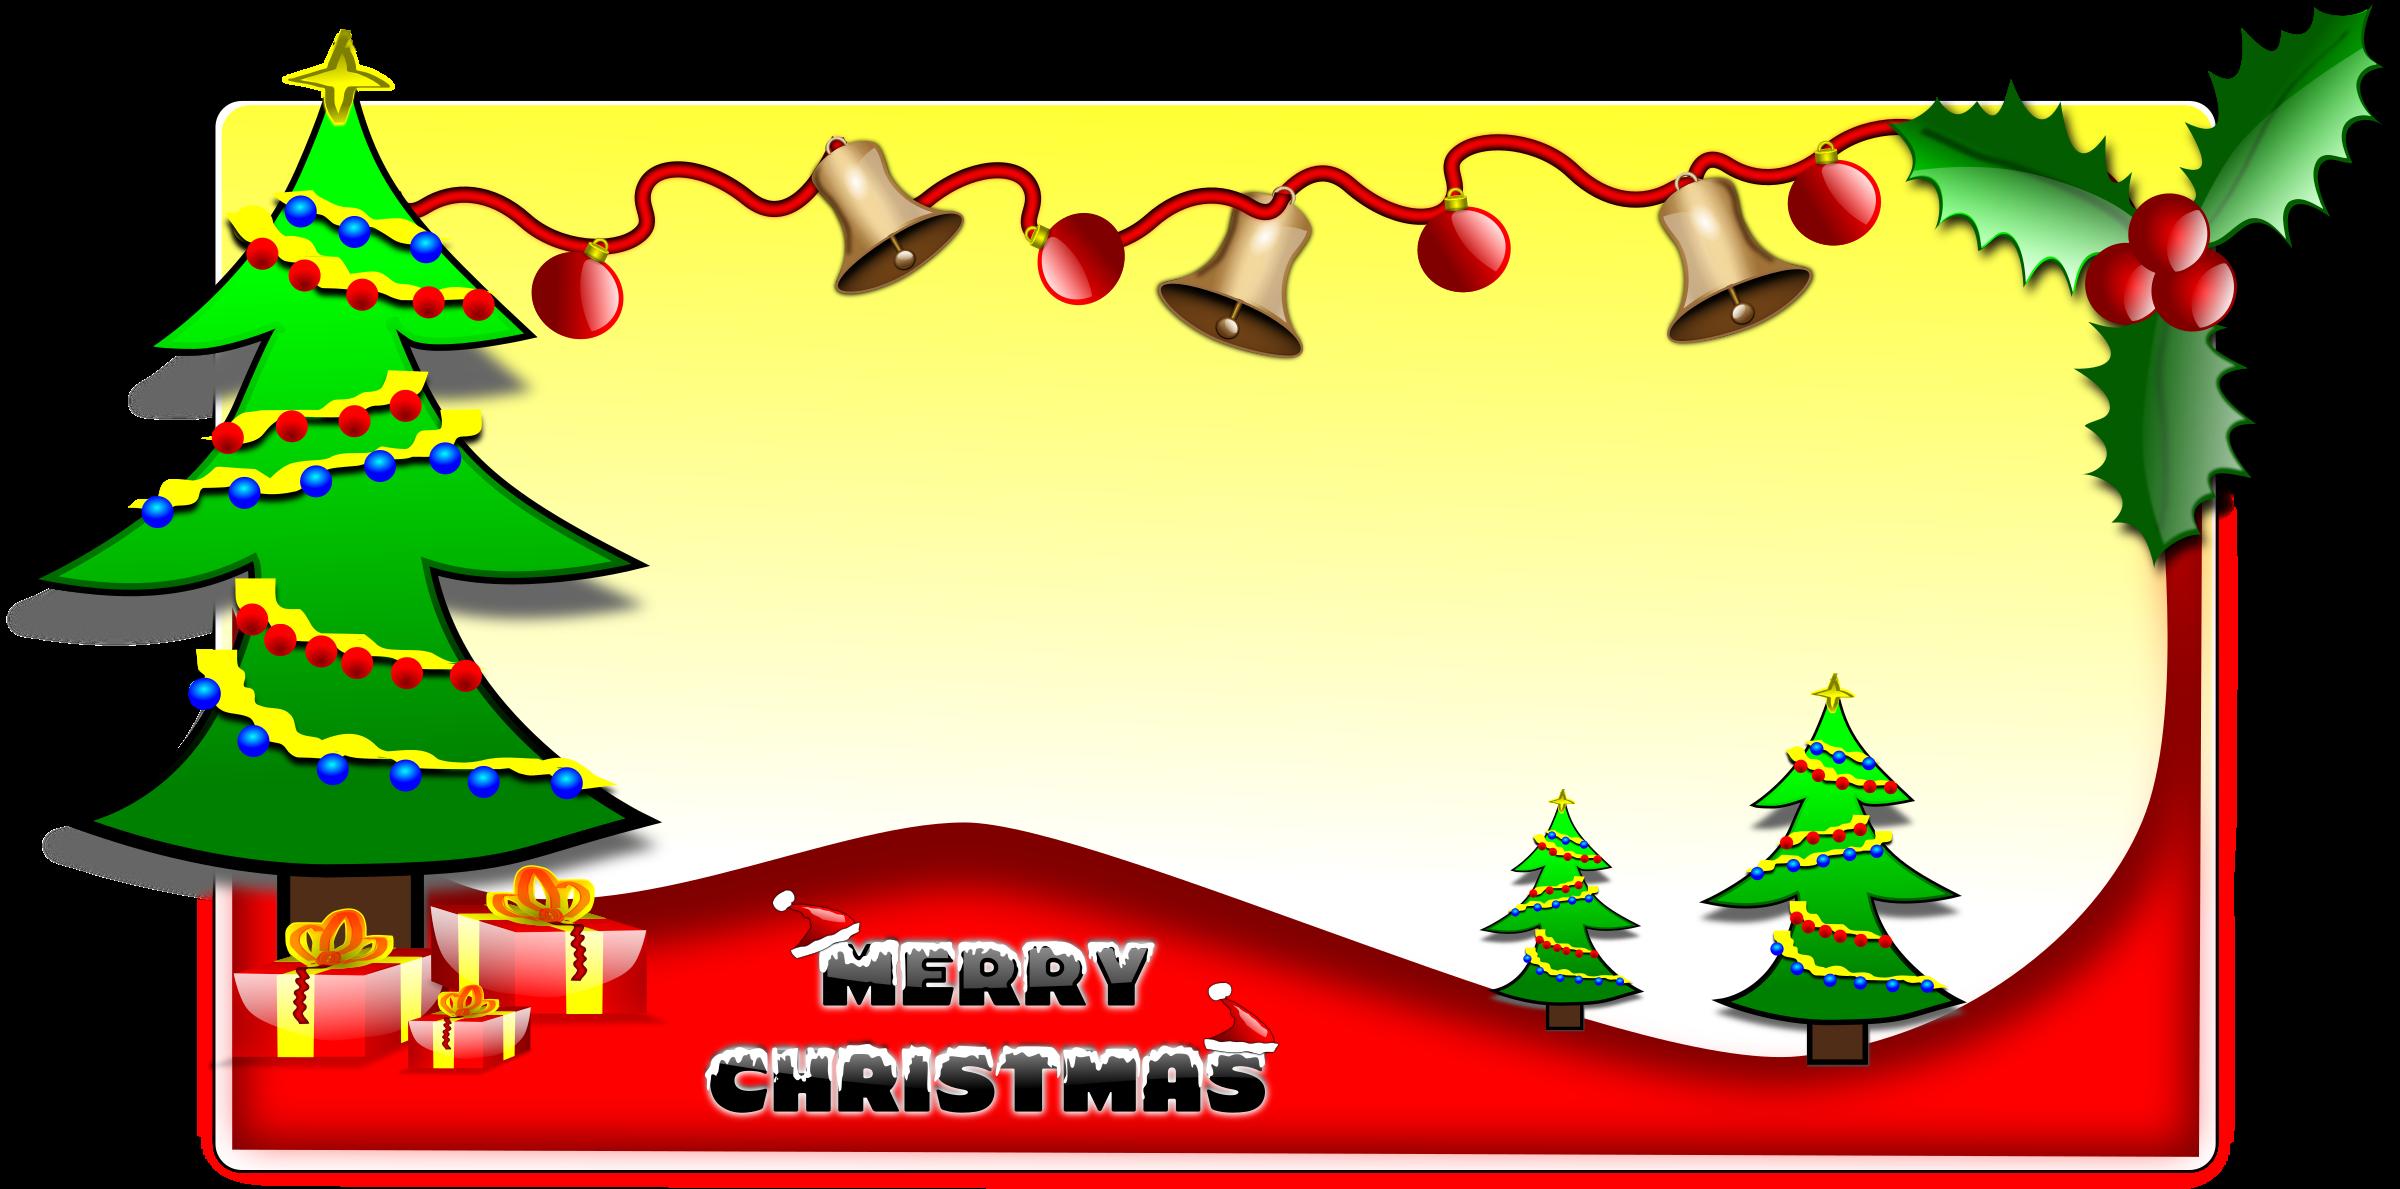 Clipart christmas design. L big image png